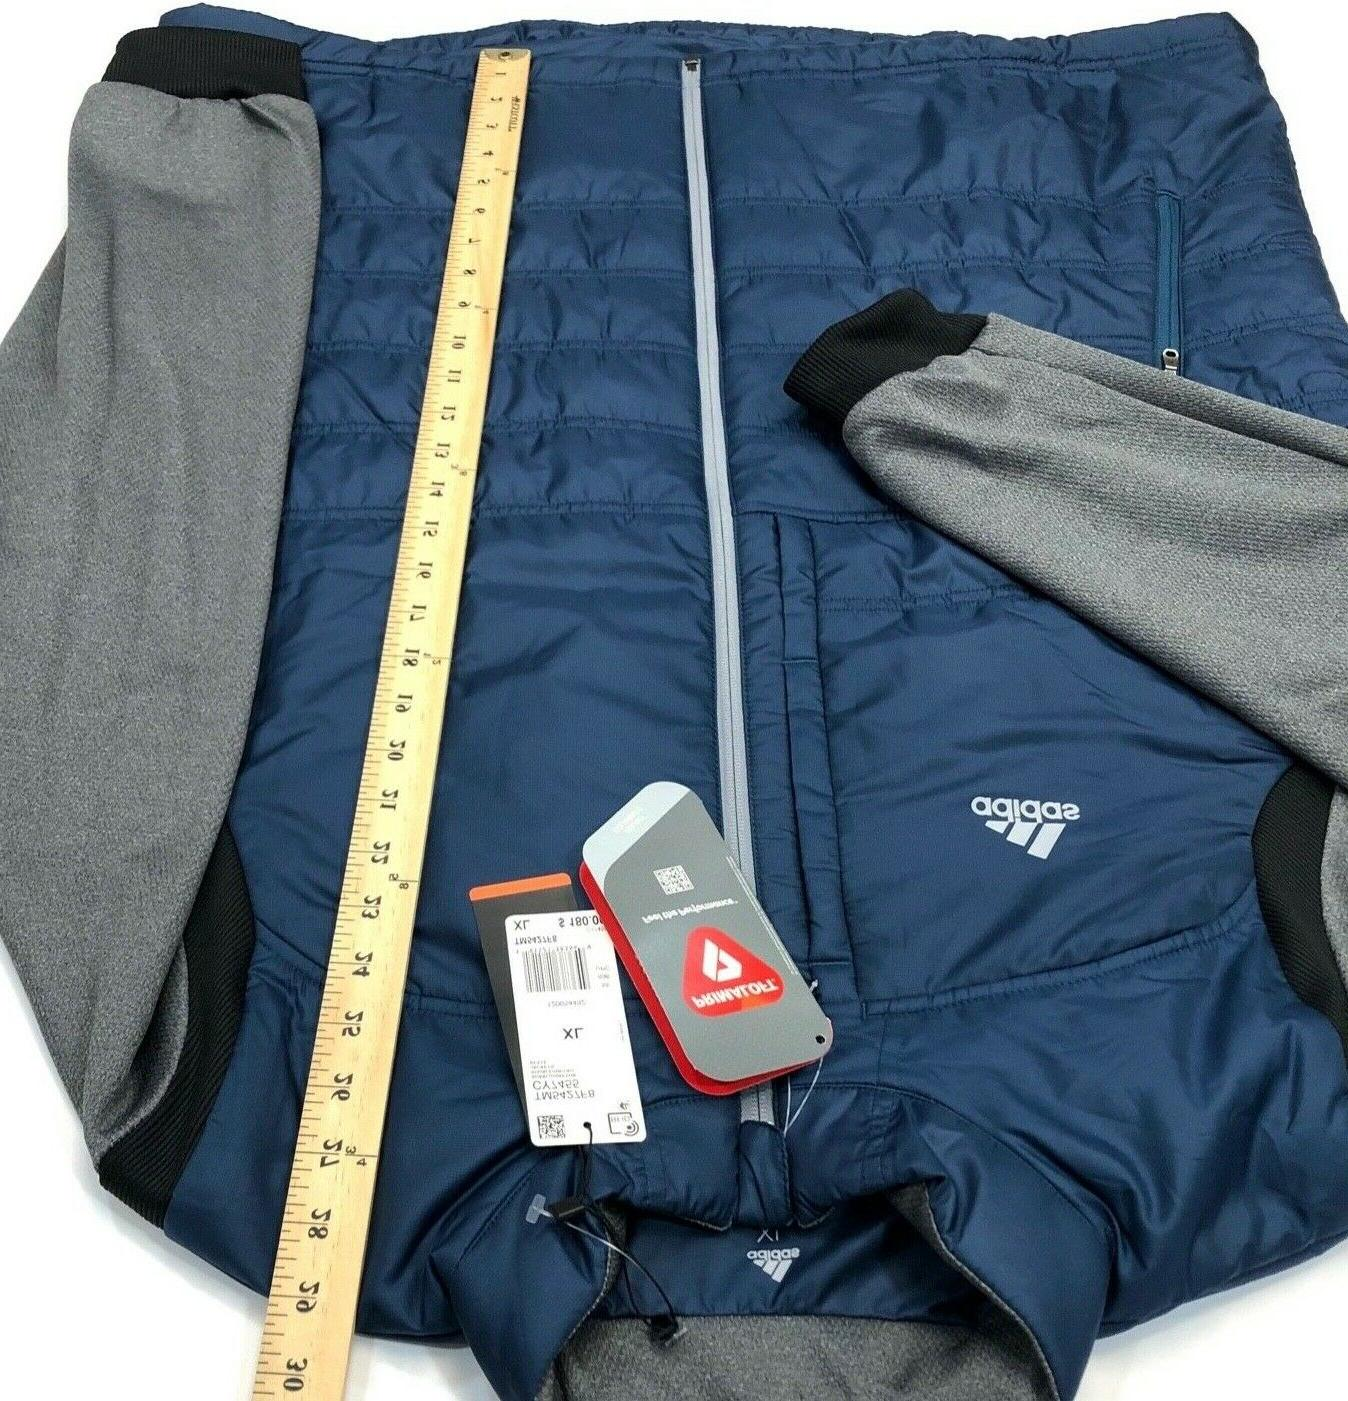 NWT 2018 Men Climaheat Frostguard Primaloft Jacket Grey $180